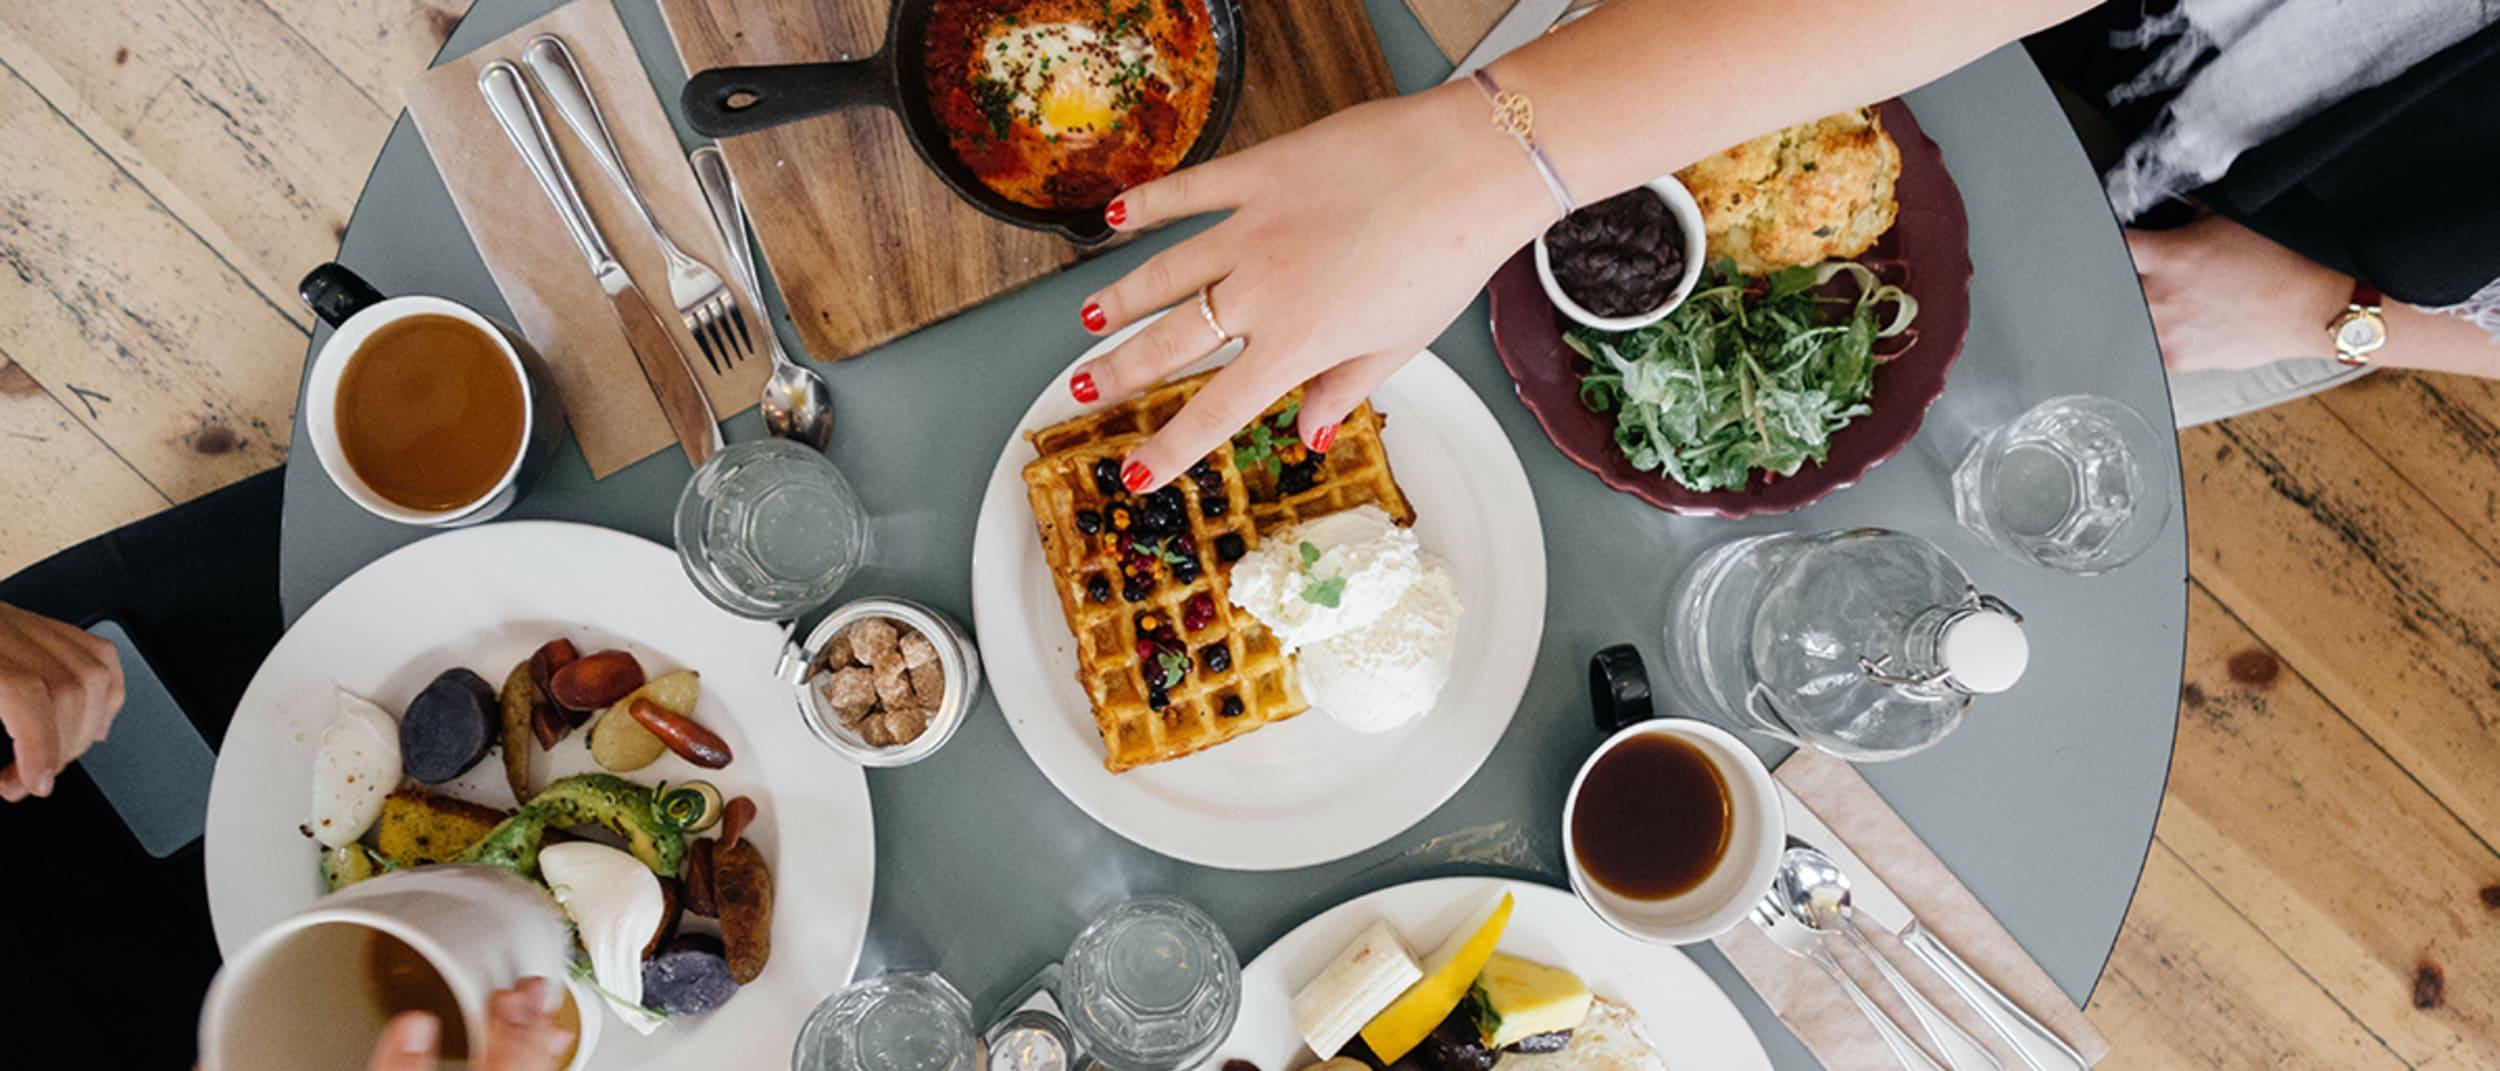 Breakfast on a table